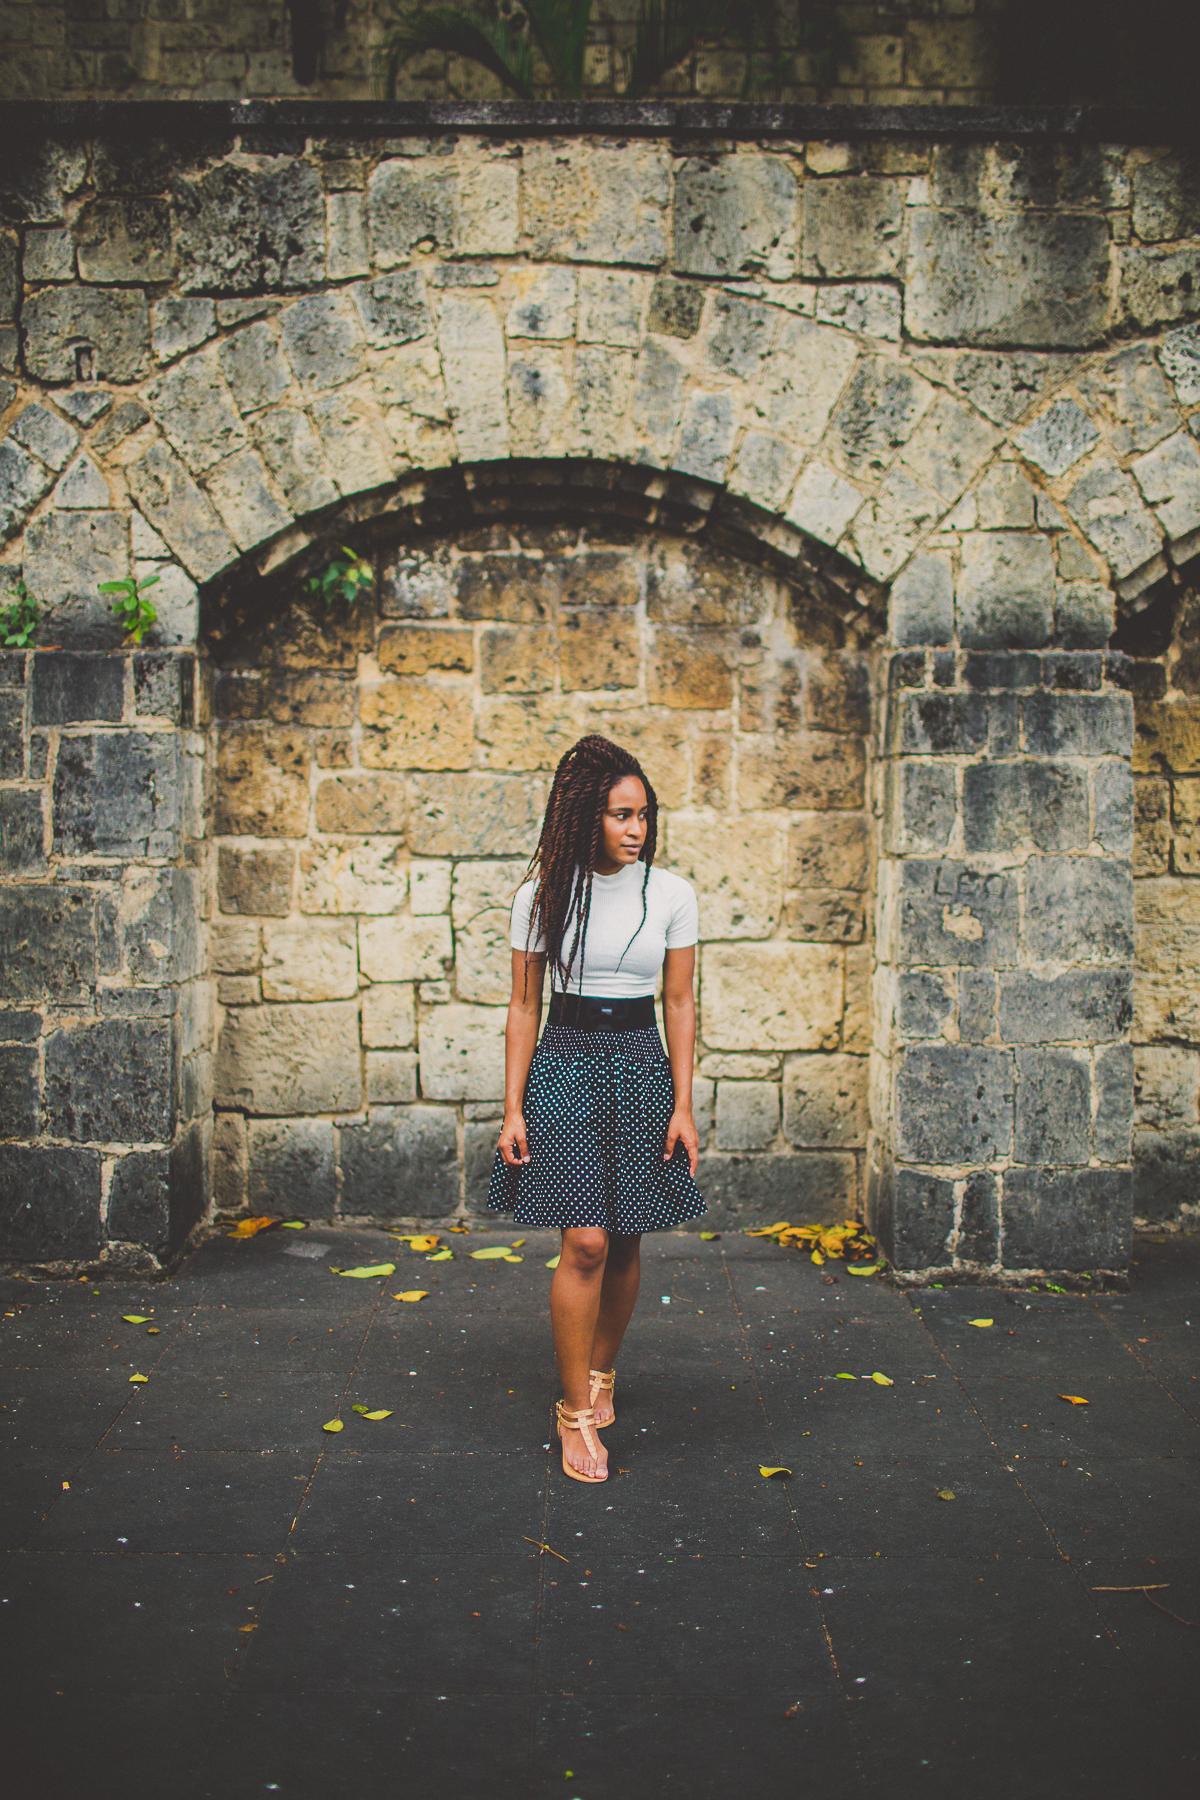 santo-domingo-kelley-raye-atlanta-lifestyle-photographer-48.jpg